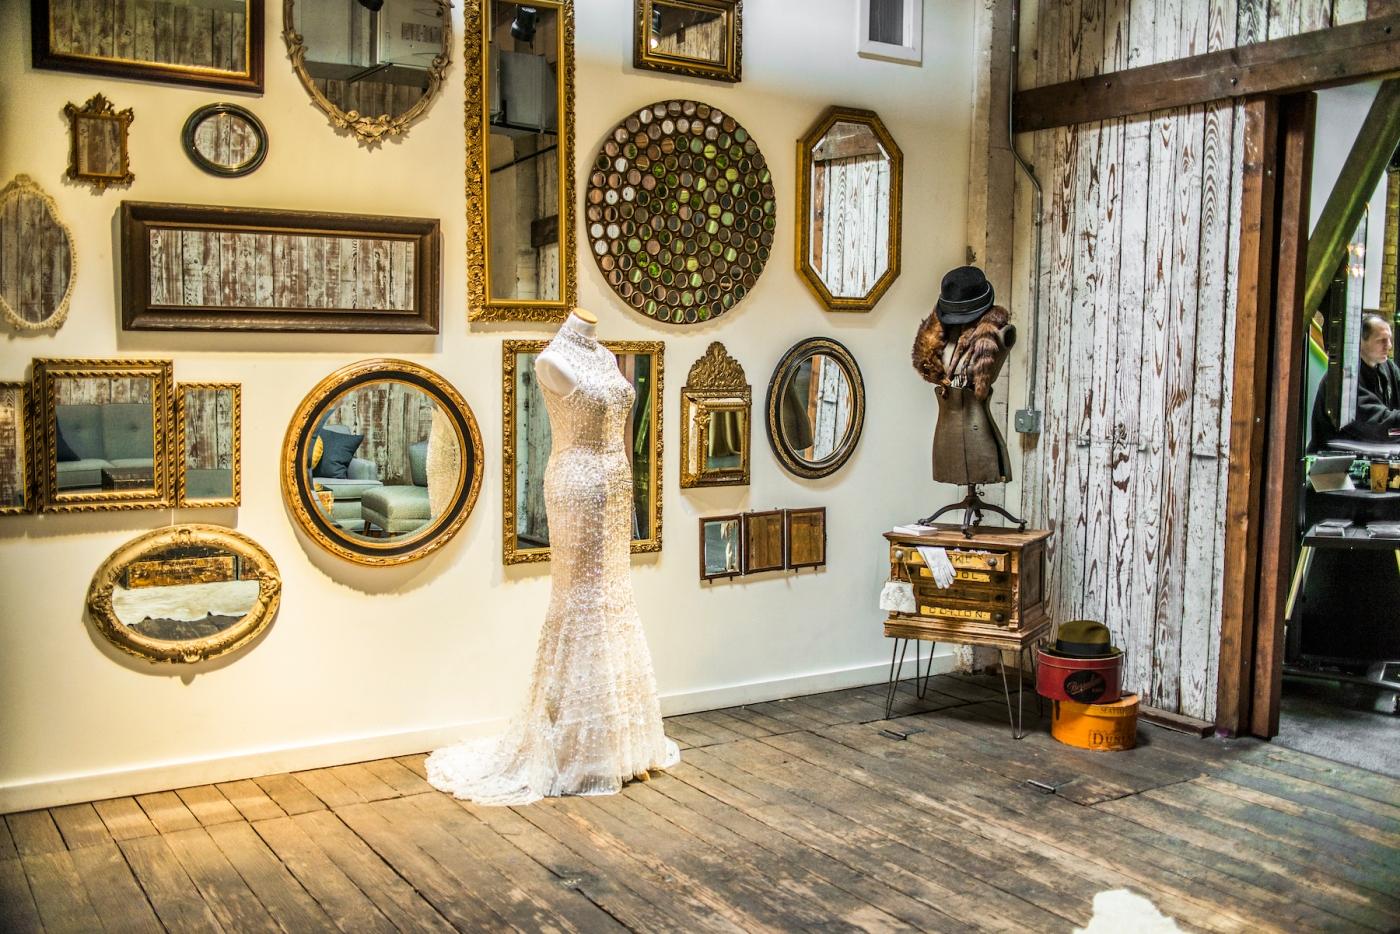 photography_by_jane_speleers_2017_wedding_show_i_do_sodo_within_designed_by_melody_davisdsc_0208